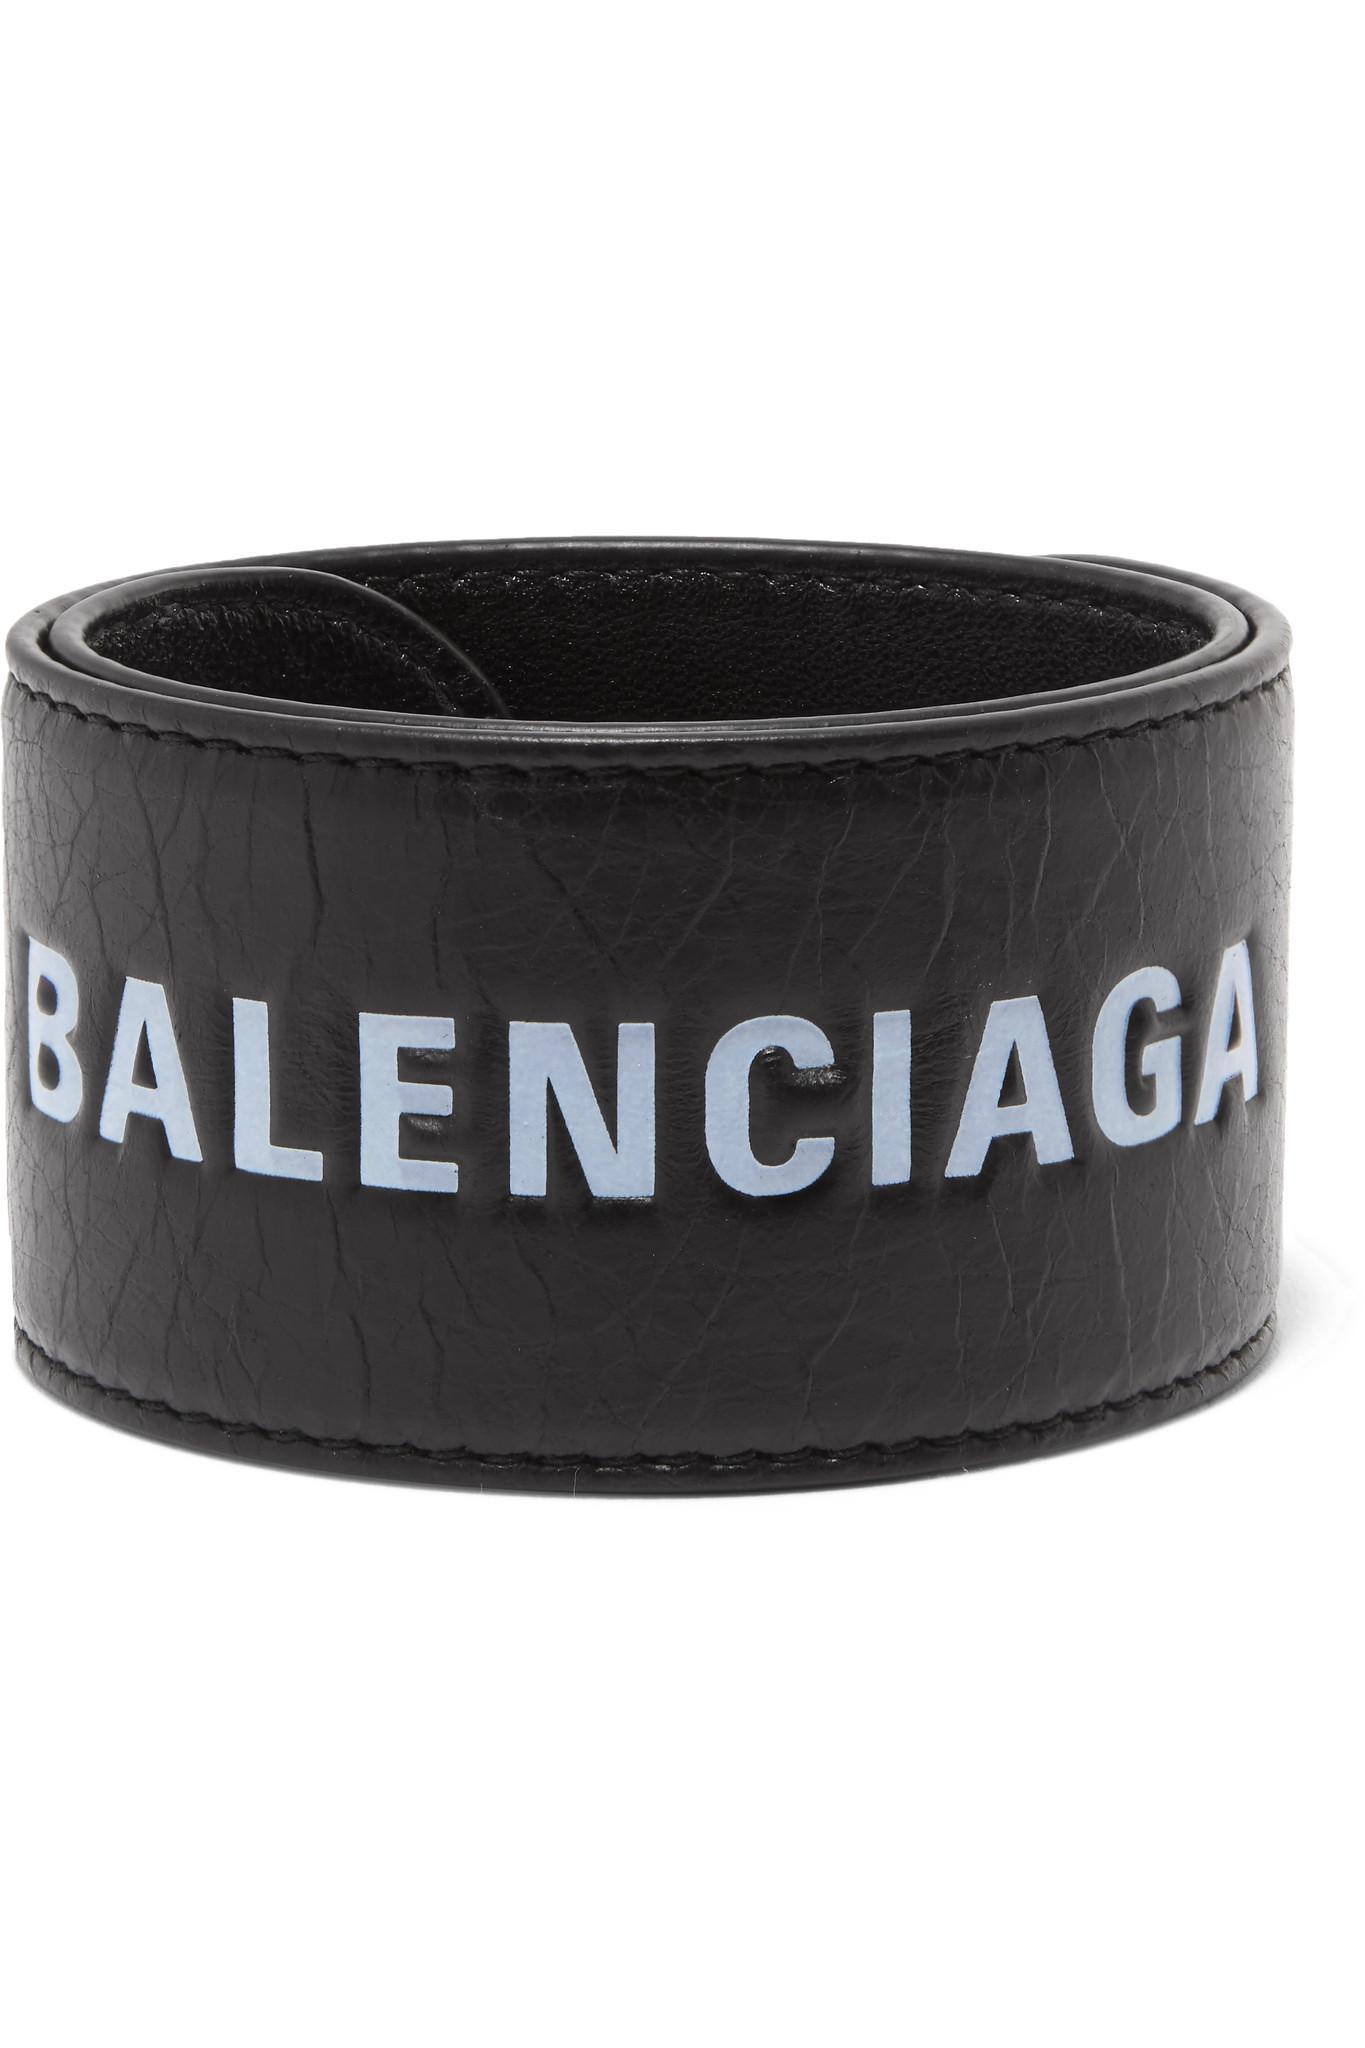 53a5102dd446b Balenciaga - Black Cycle Printed Textured-leather Bracelet - Lyst. View  fullscreen